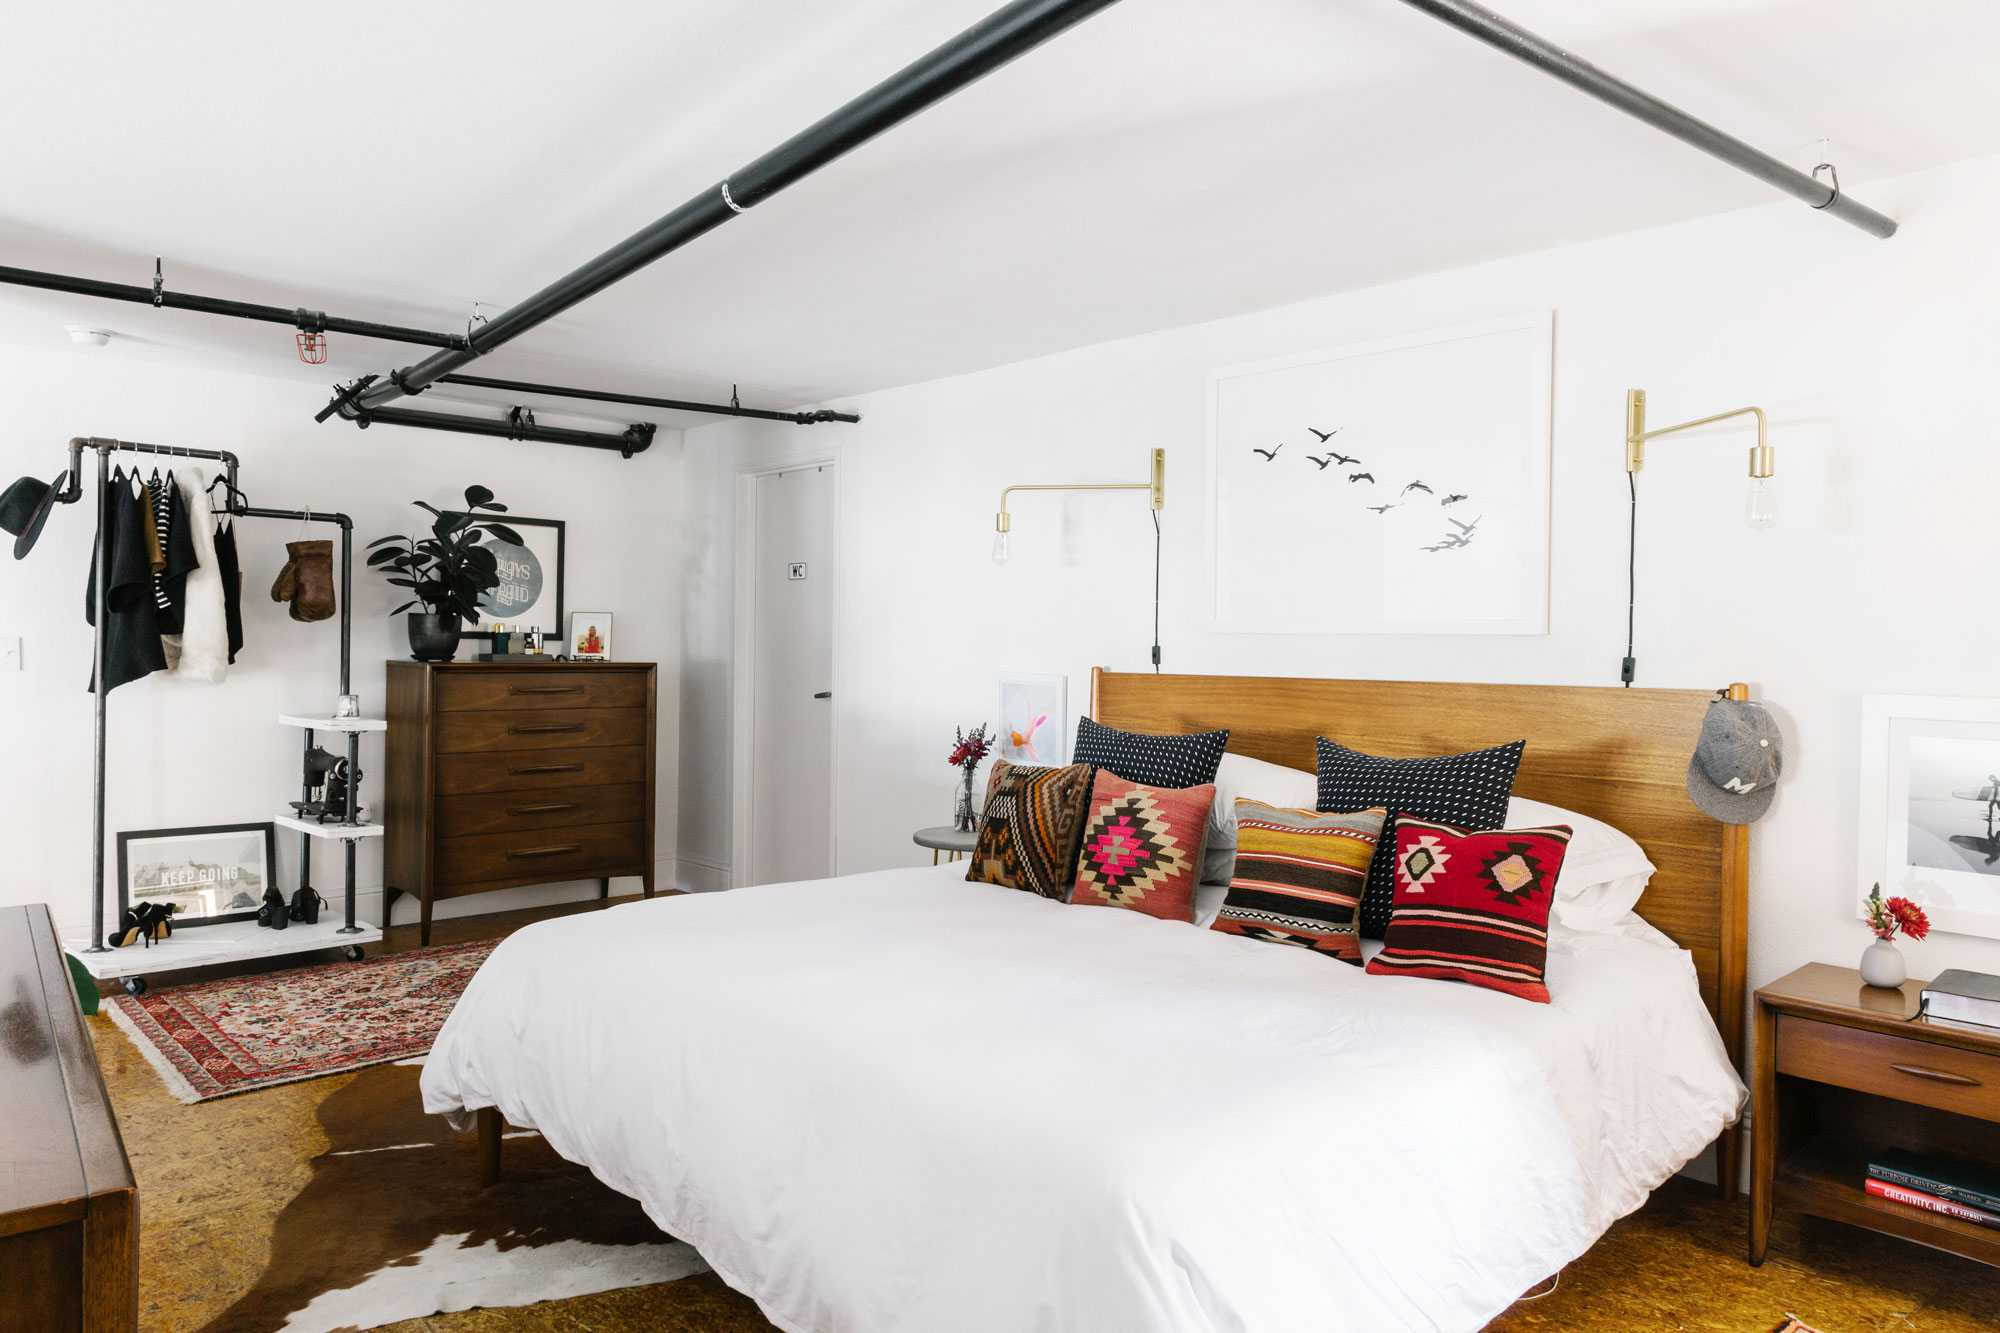 storage as decor